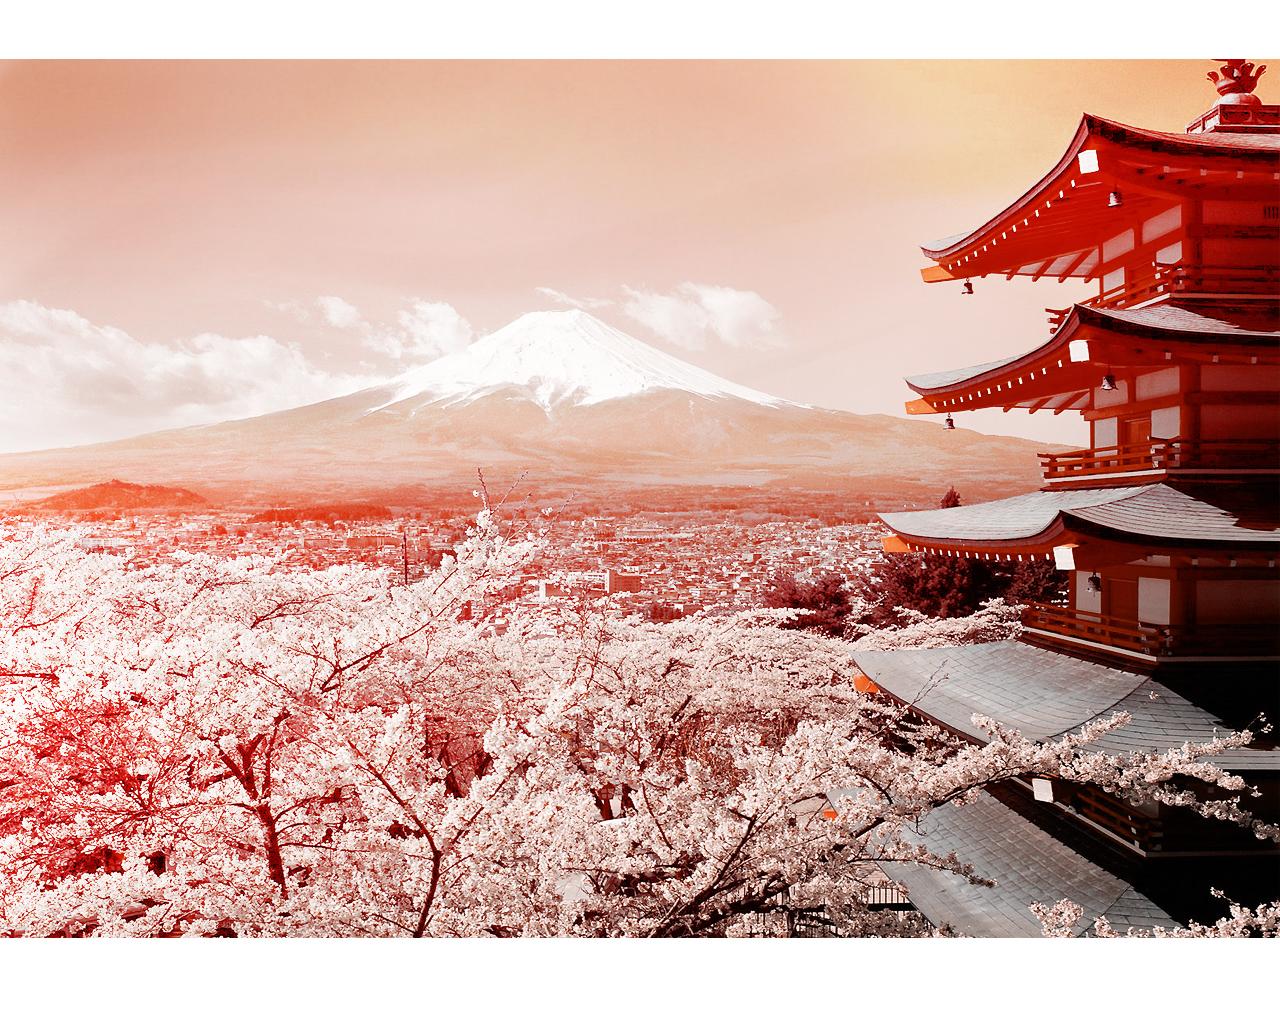 Curiosidades sobre o Monte Fuji Fuji_Cherry_Blossoms_by_britmodtokyo